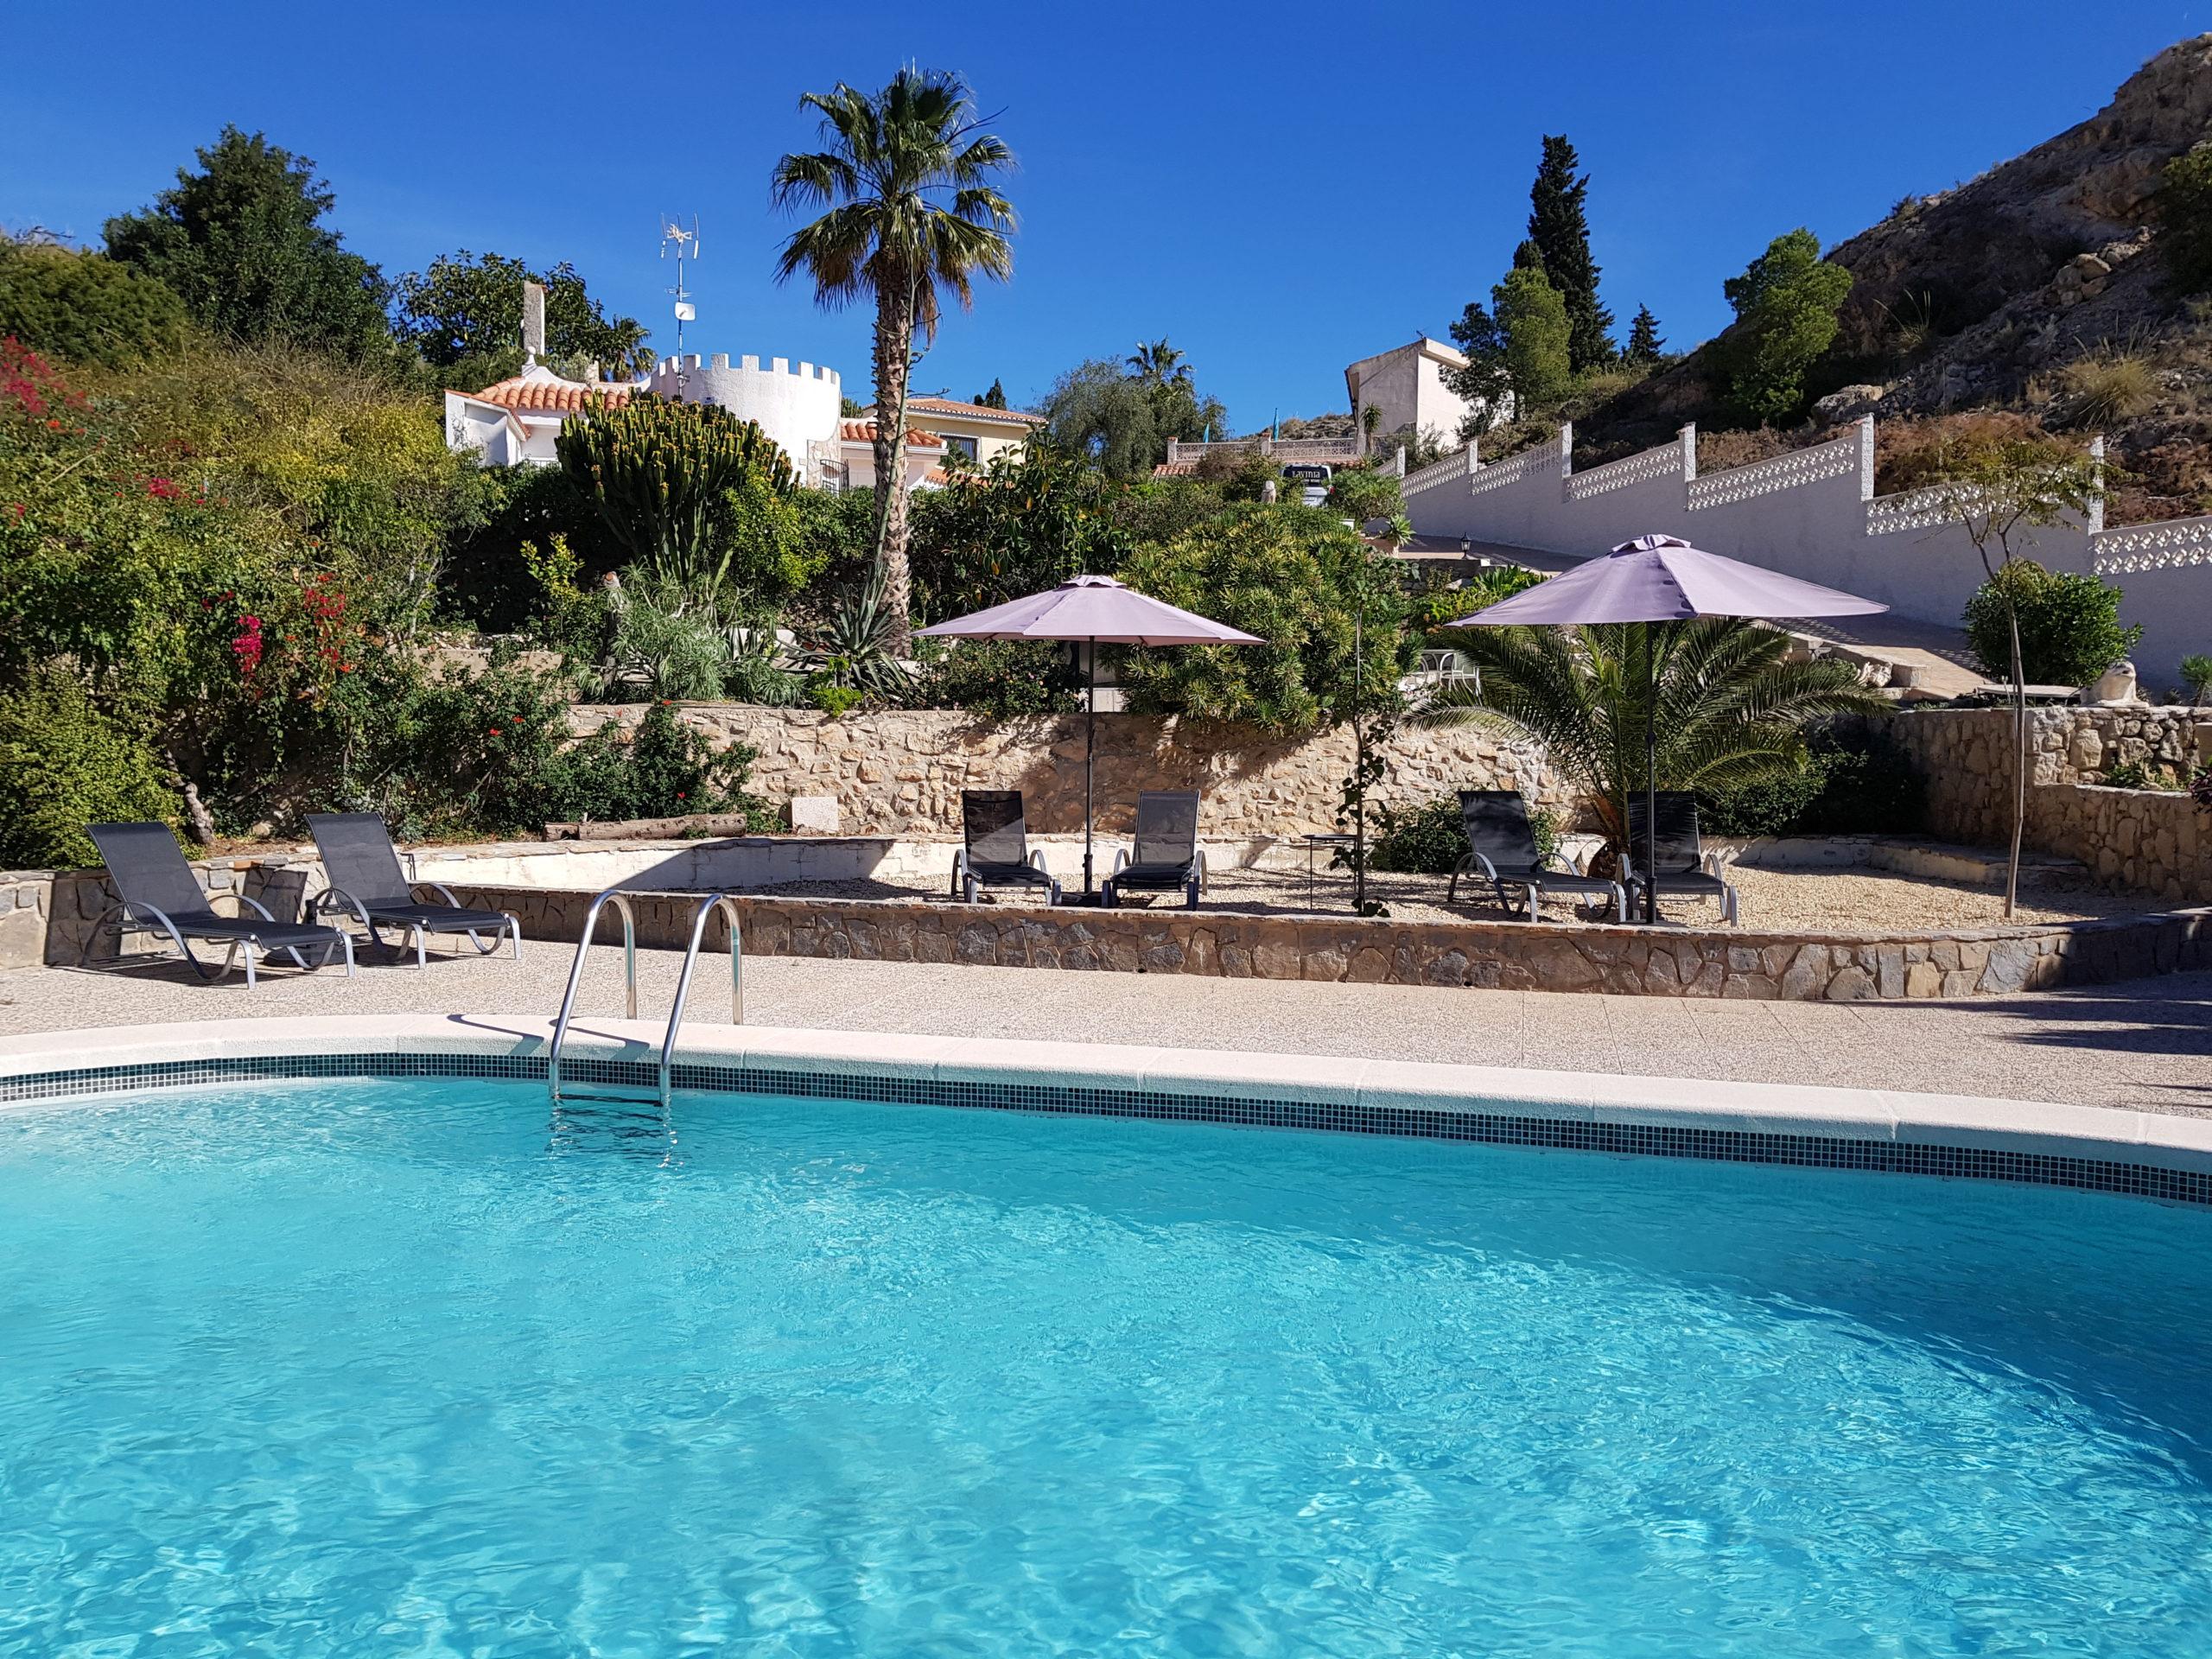 Lavinia Naturist Resort - Costa Blanca, Alicante. Villas Naturistas.